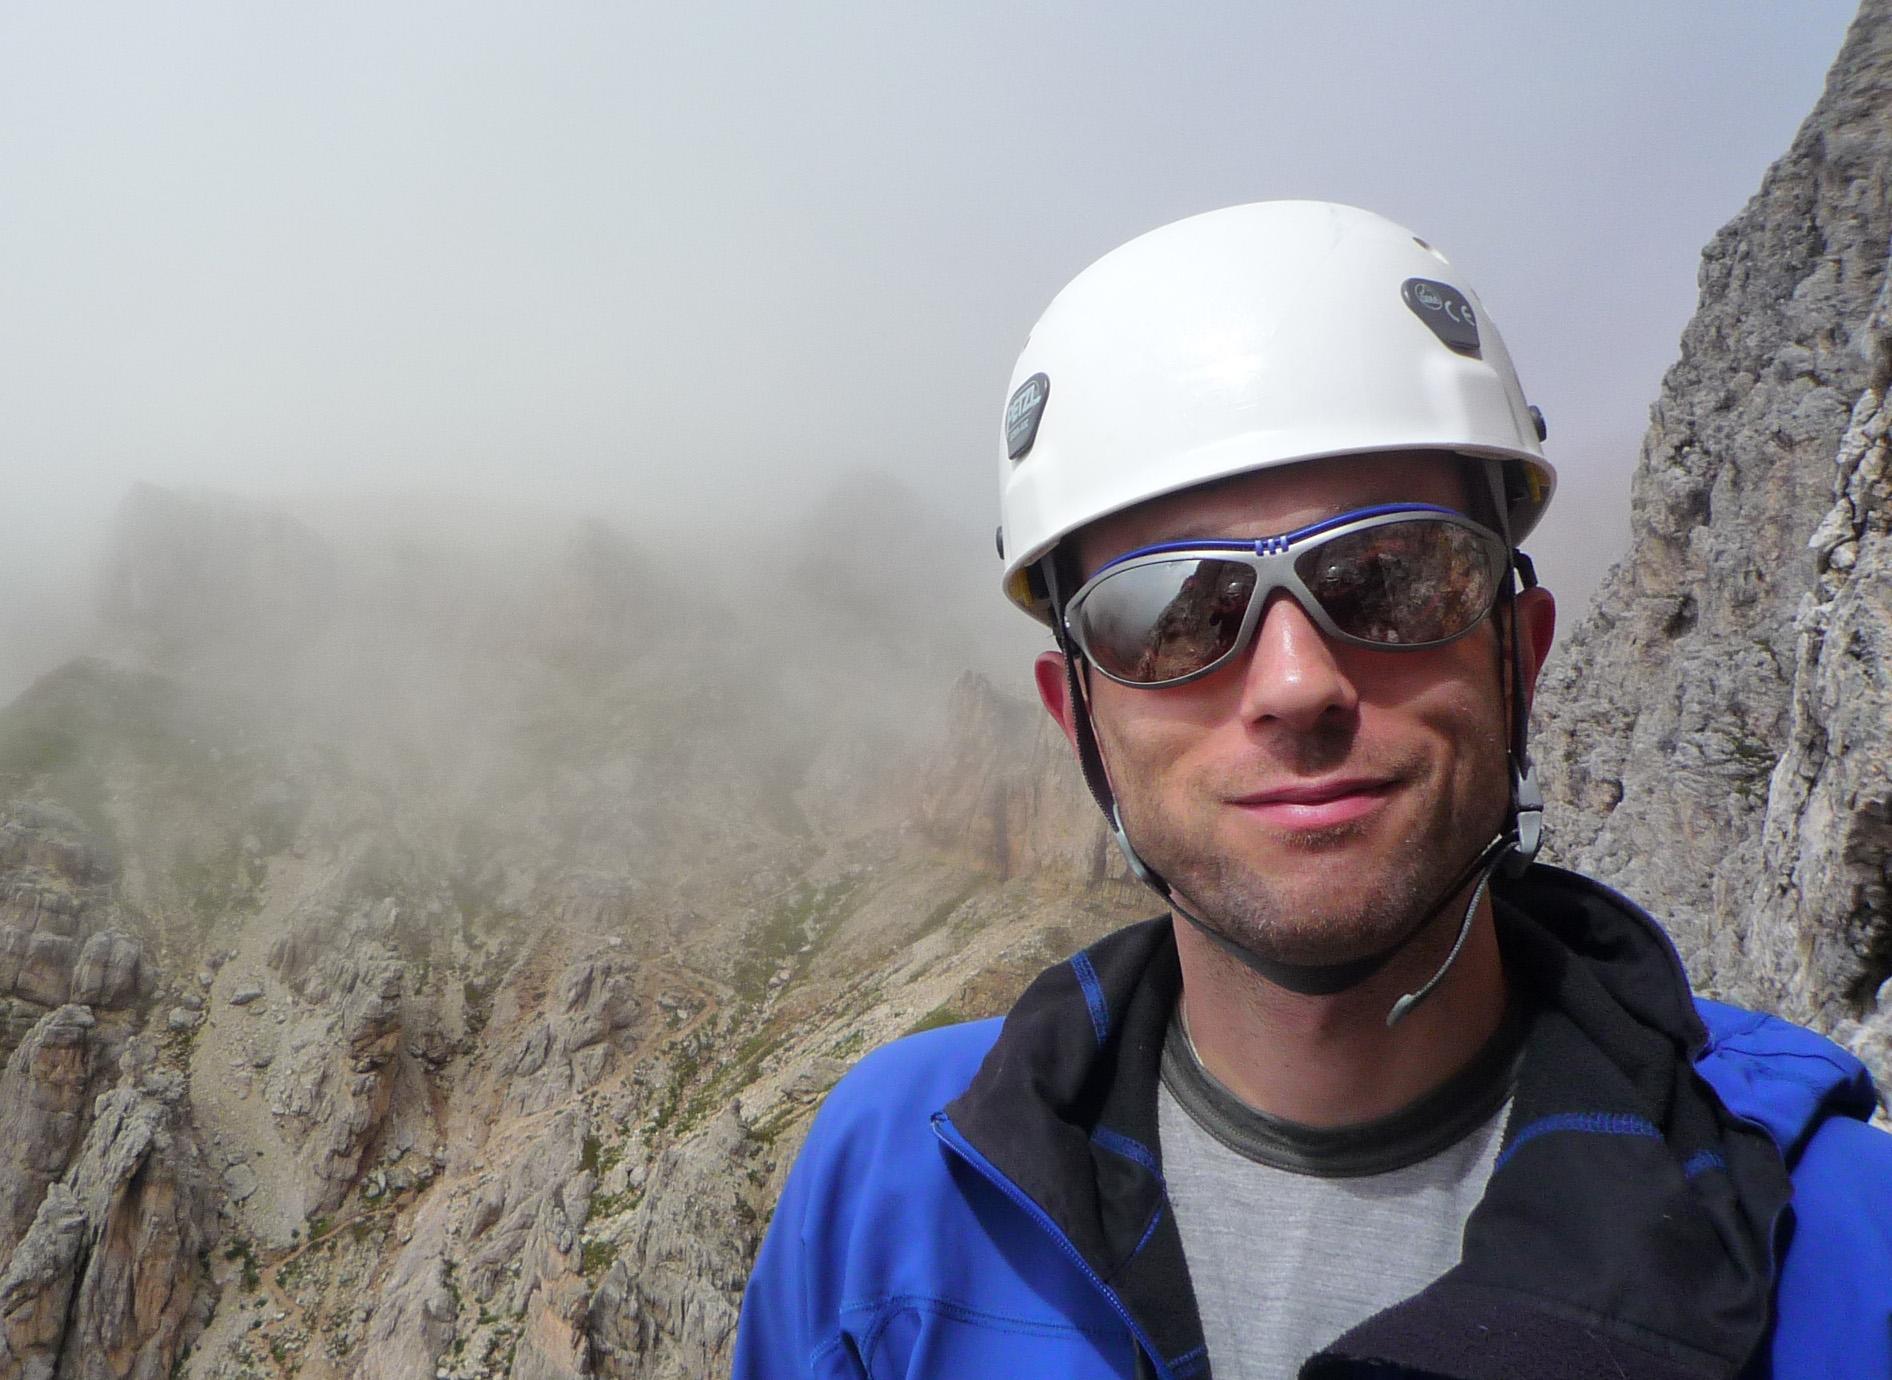 Helmets for Big Heads – the Severe climber